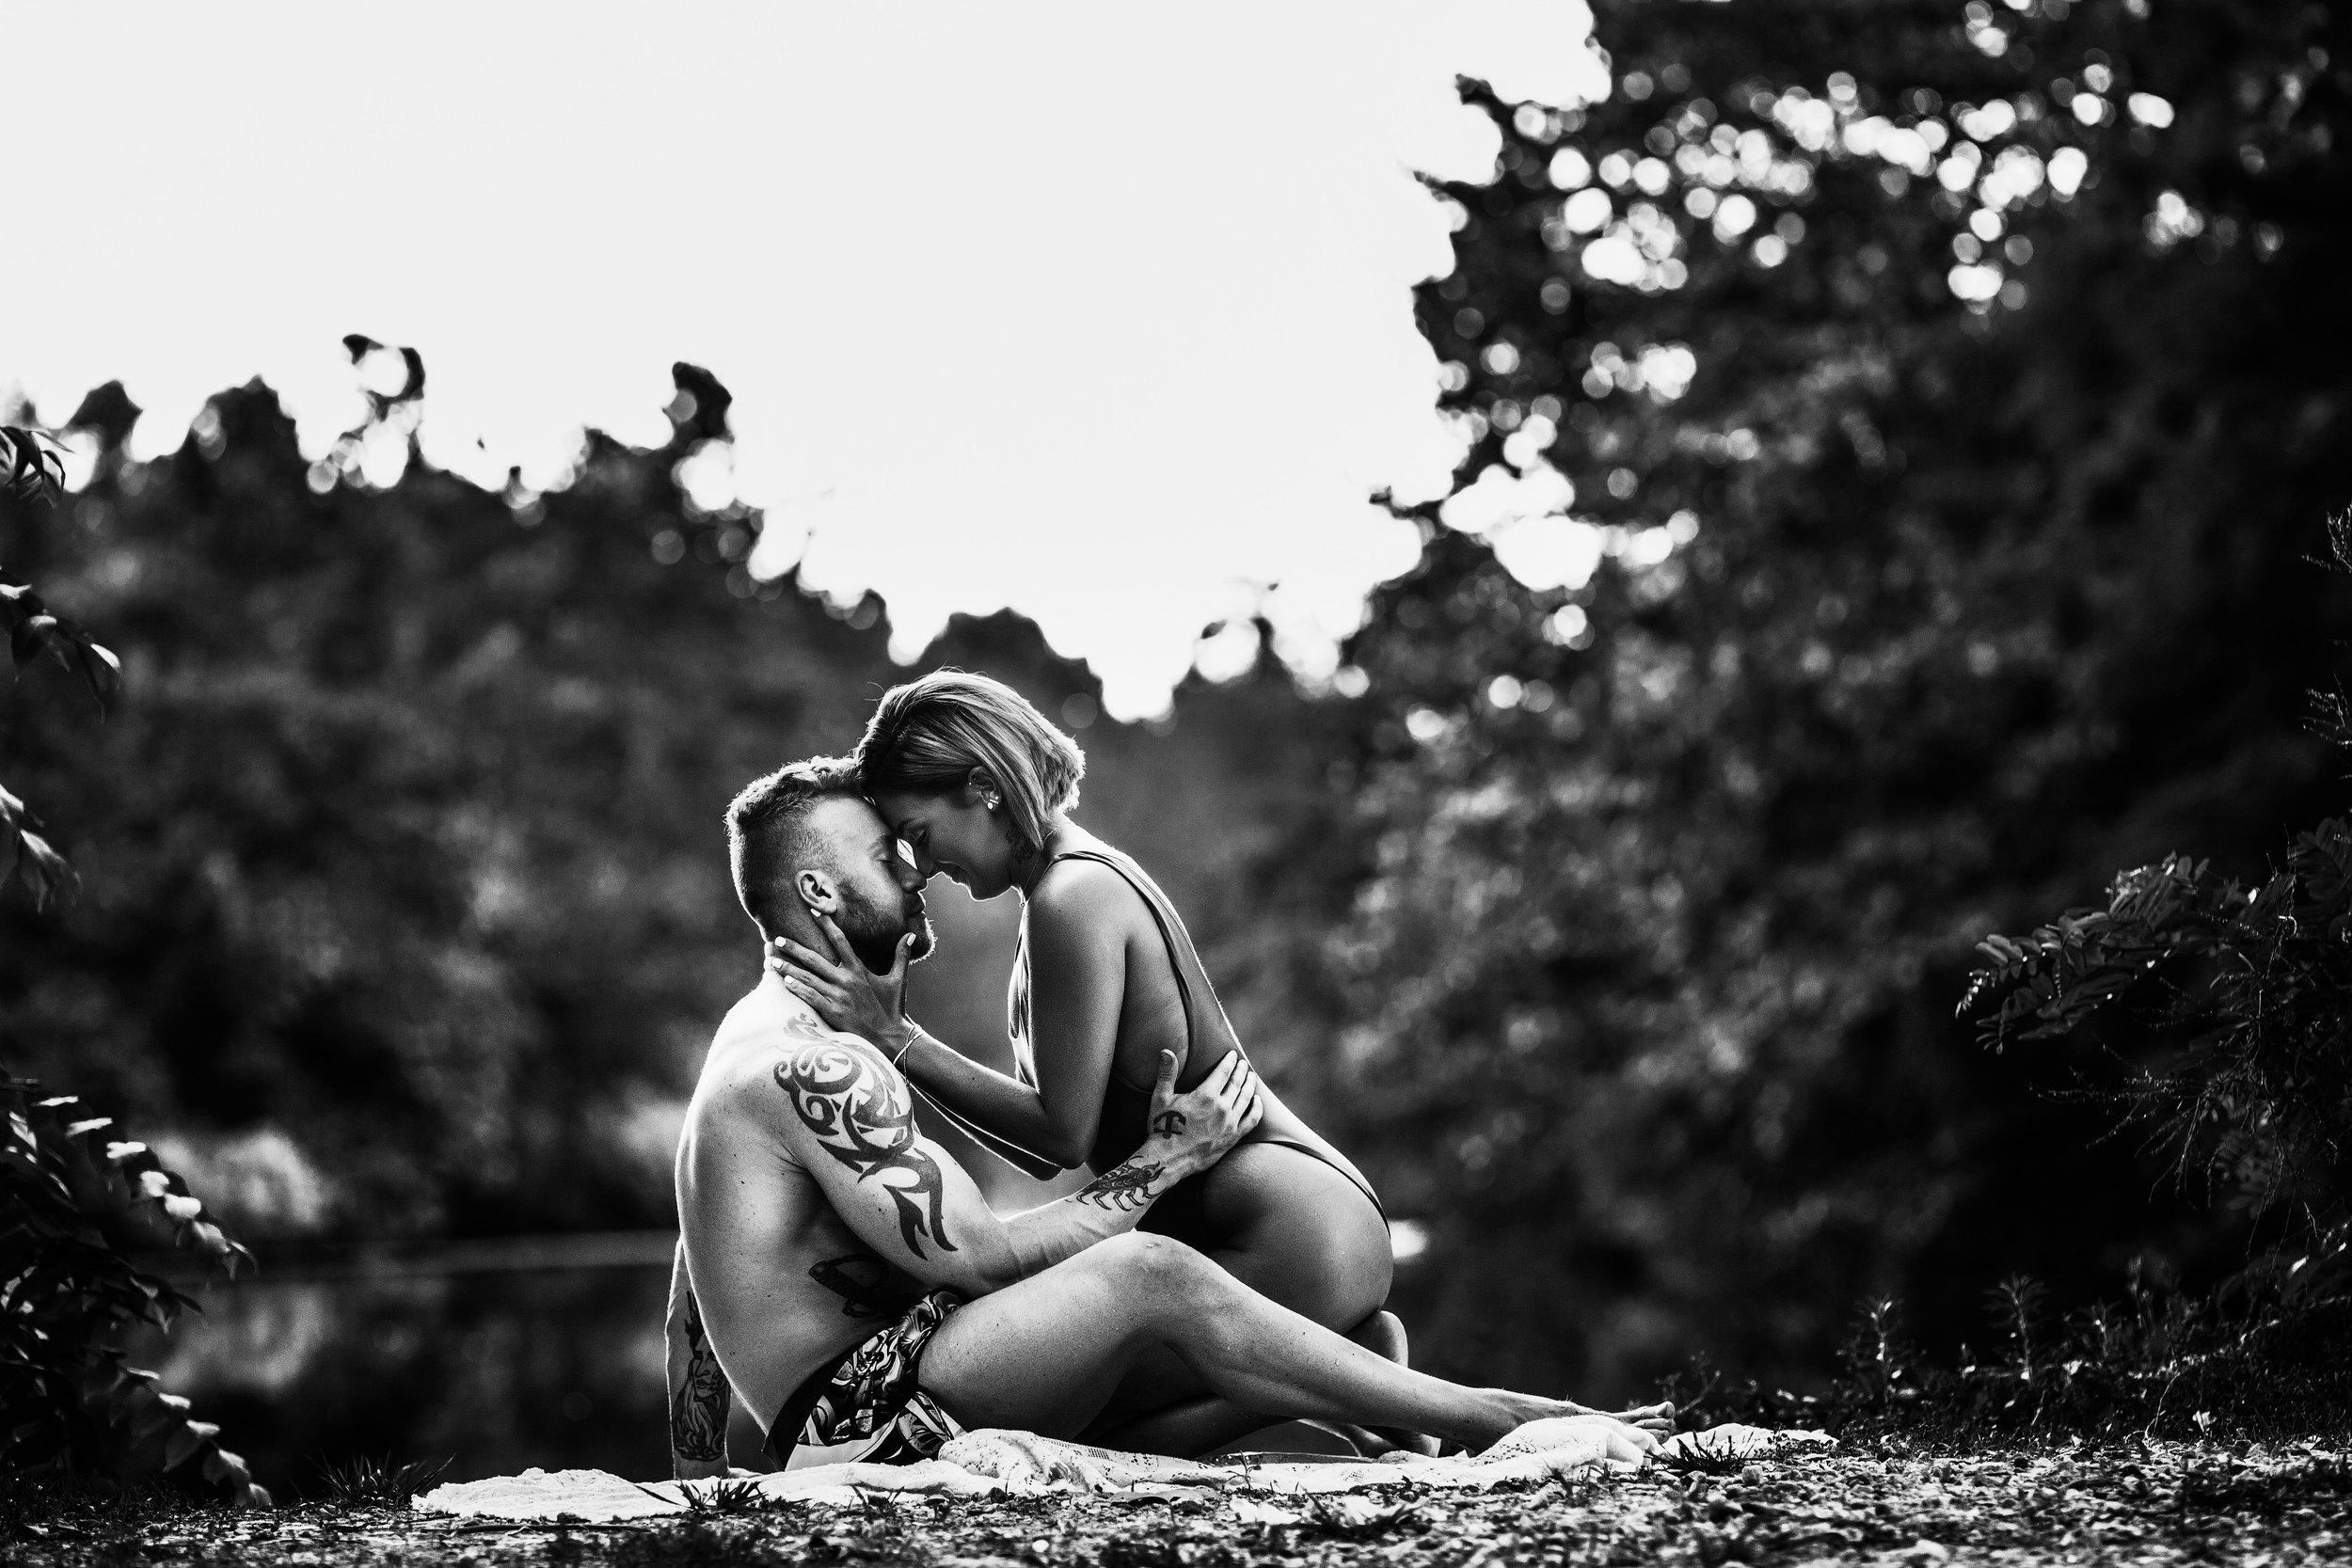 A steamy lakeside couples session by Missouri Wedding & Portrait Photographer, Teri Ann Forck.